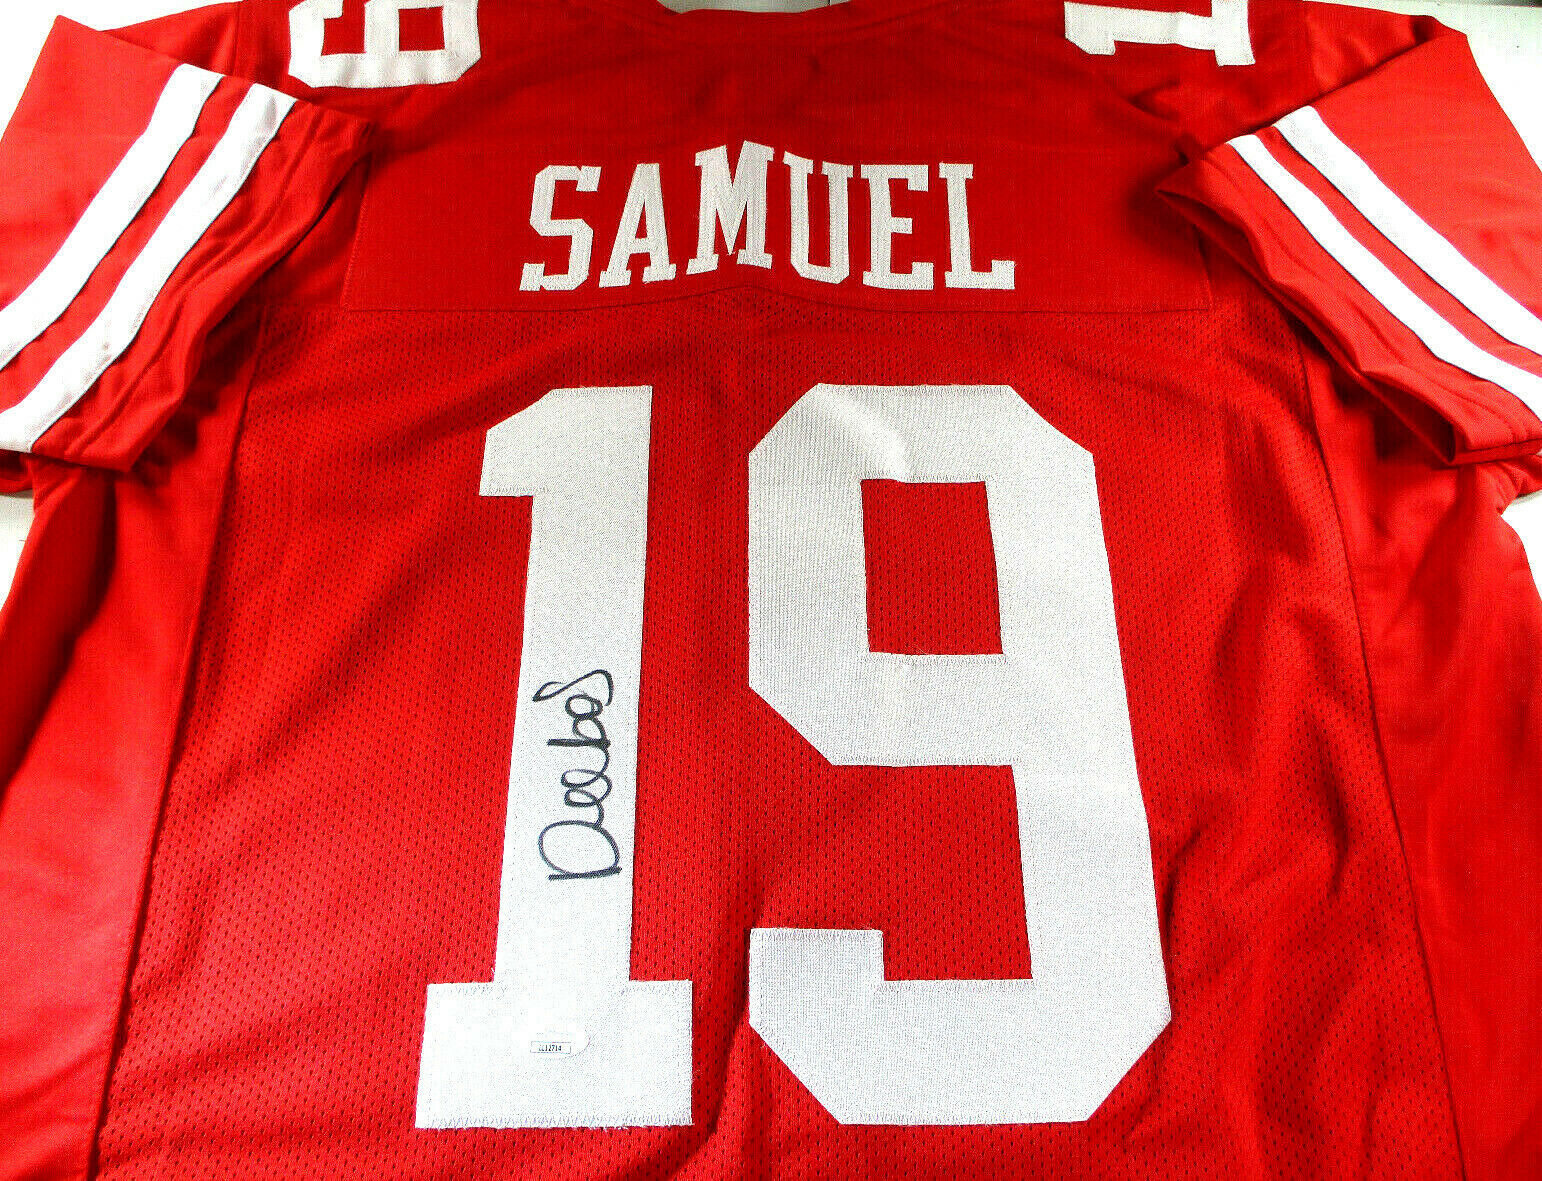 DEEBO SAMUEL / AUTOGRAPHED SAN FRANCISCO 49ERS RED CUSTOM FOOTBALL JERSEY / JSA